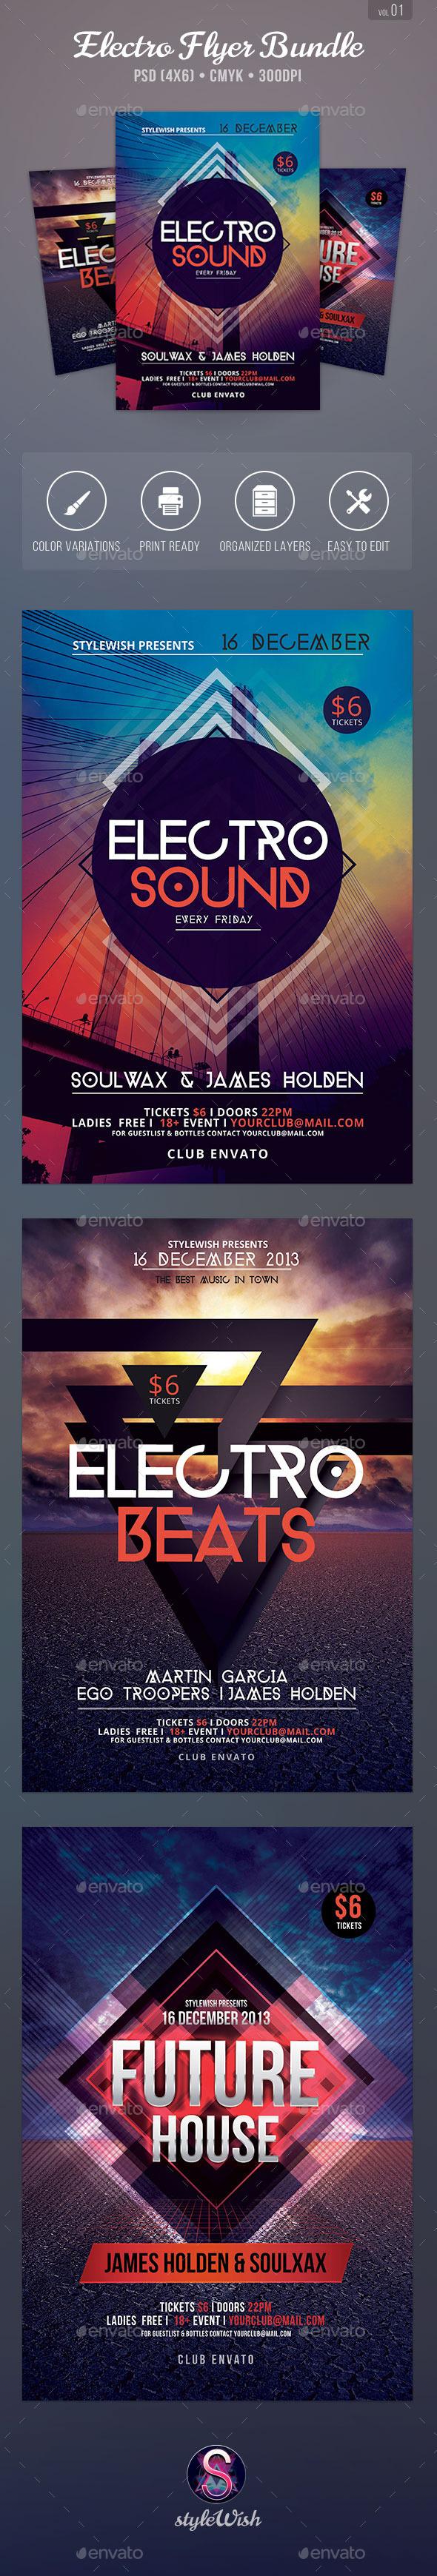 Electro Party Flyer Bundle Vol2 - Clubs & Parties Events